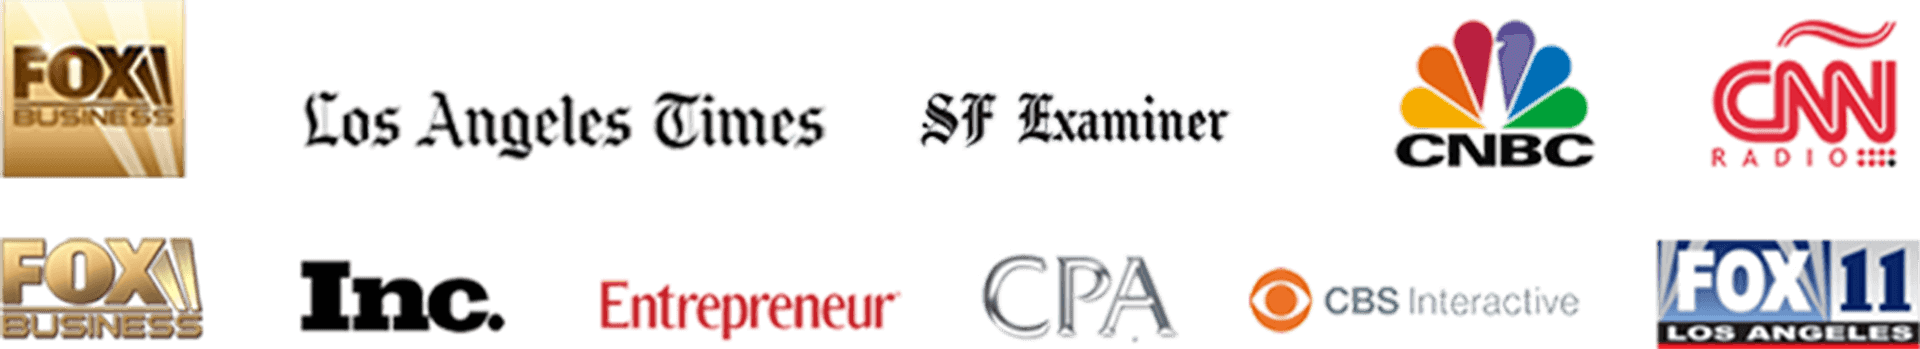 roz-media-logos2